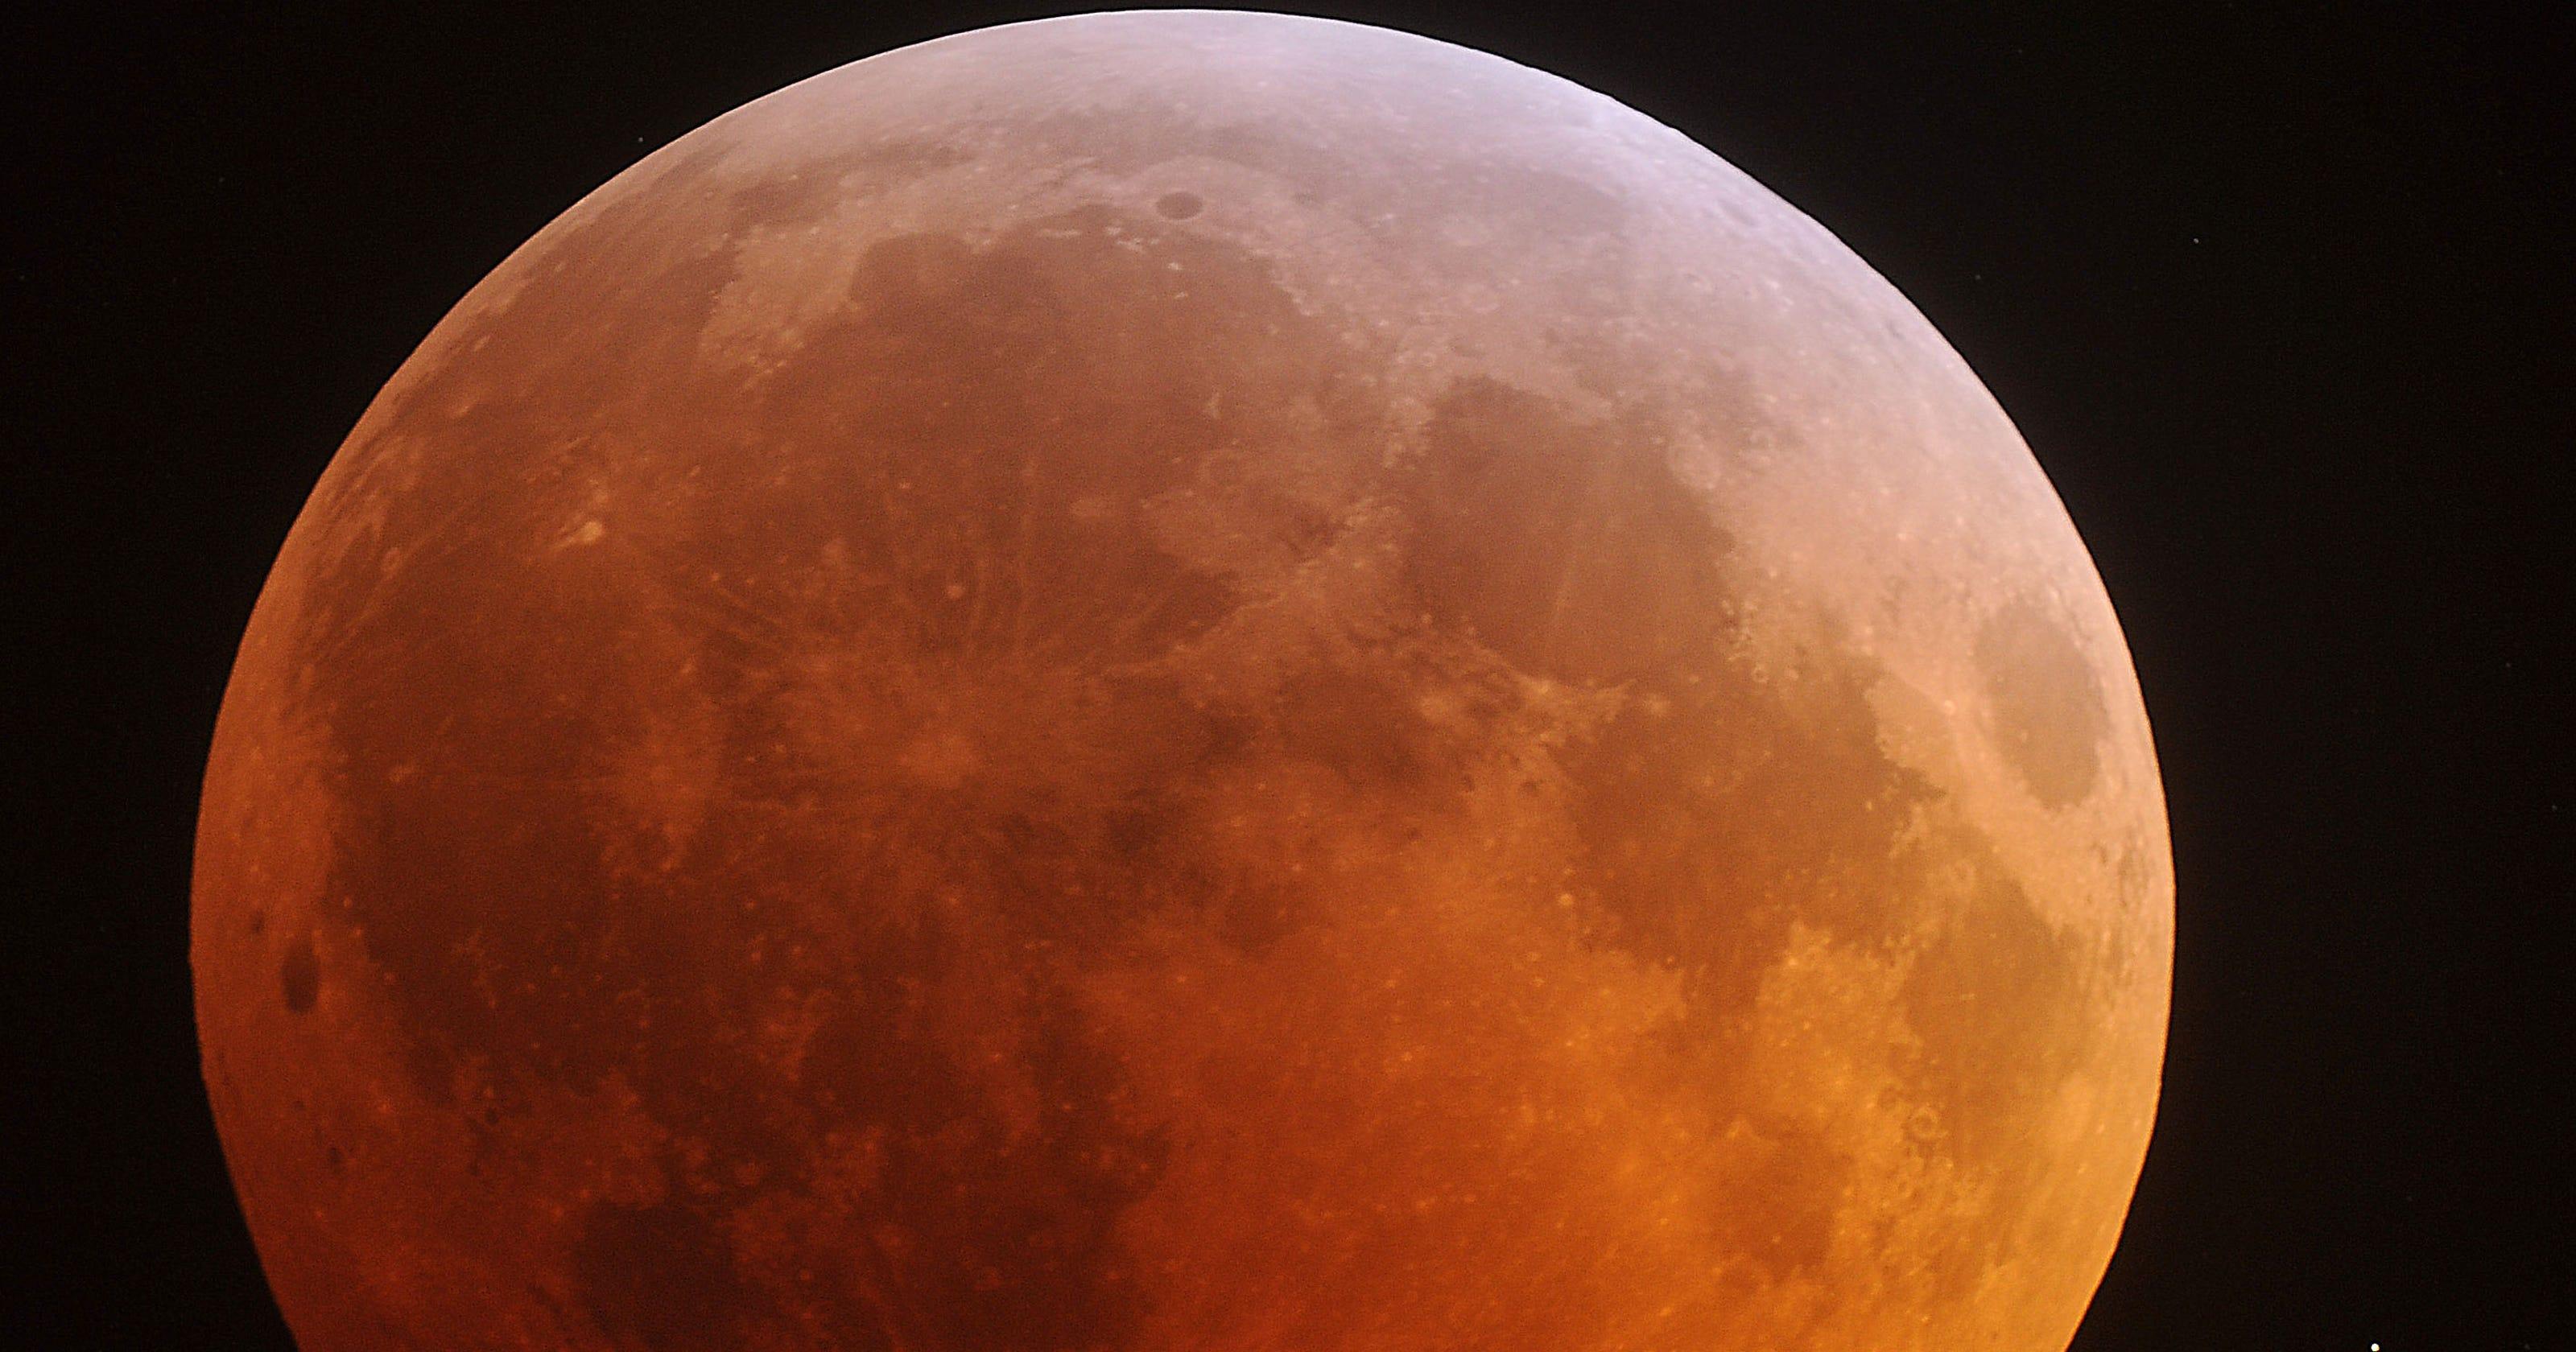 blood moon eclipse hyderabad - photo #8